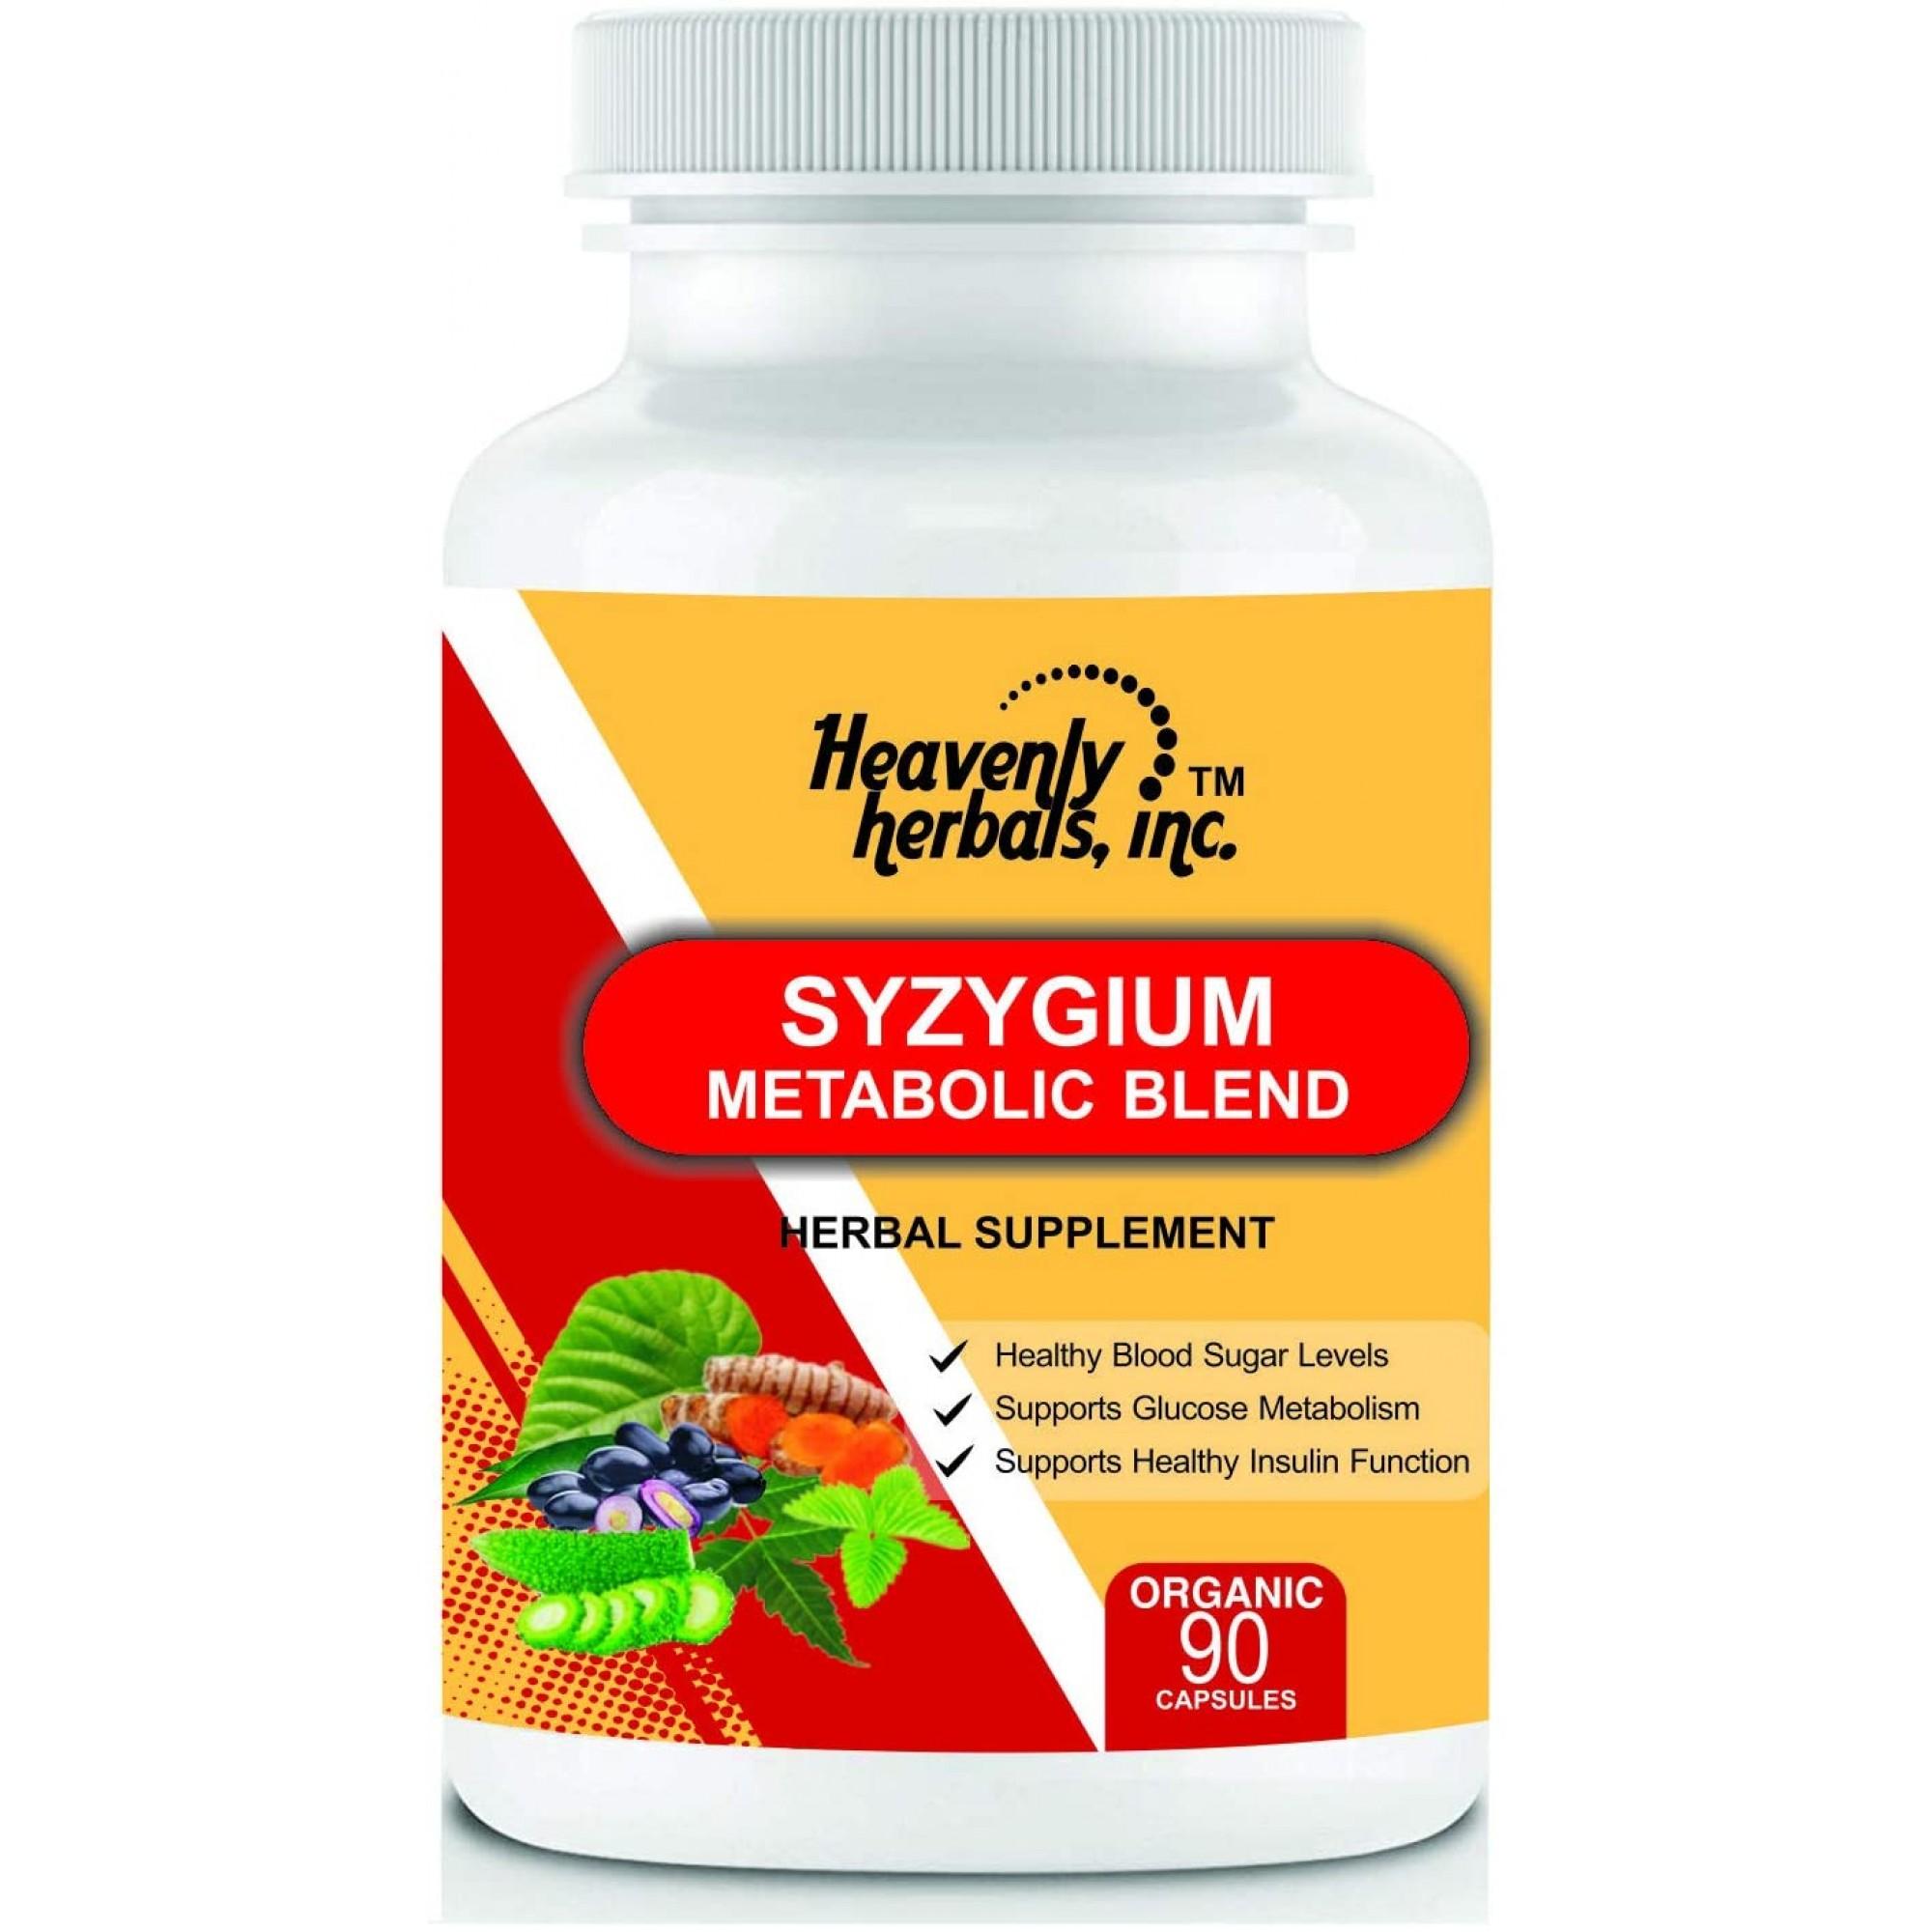 Syzygium Metabolic Blend Capsules